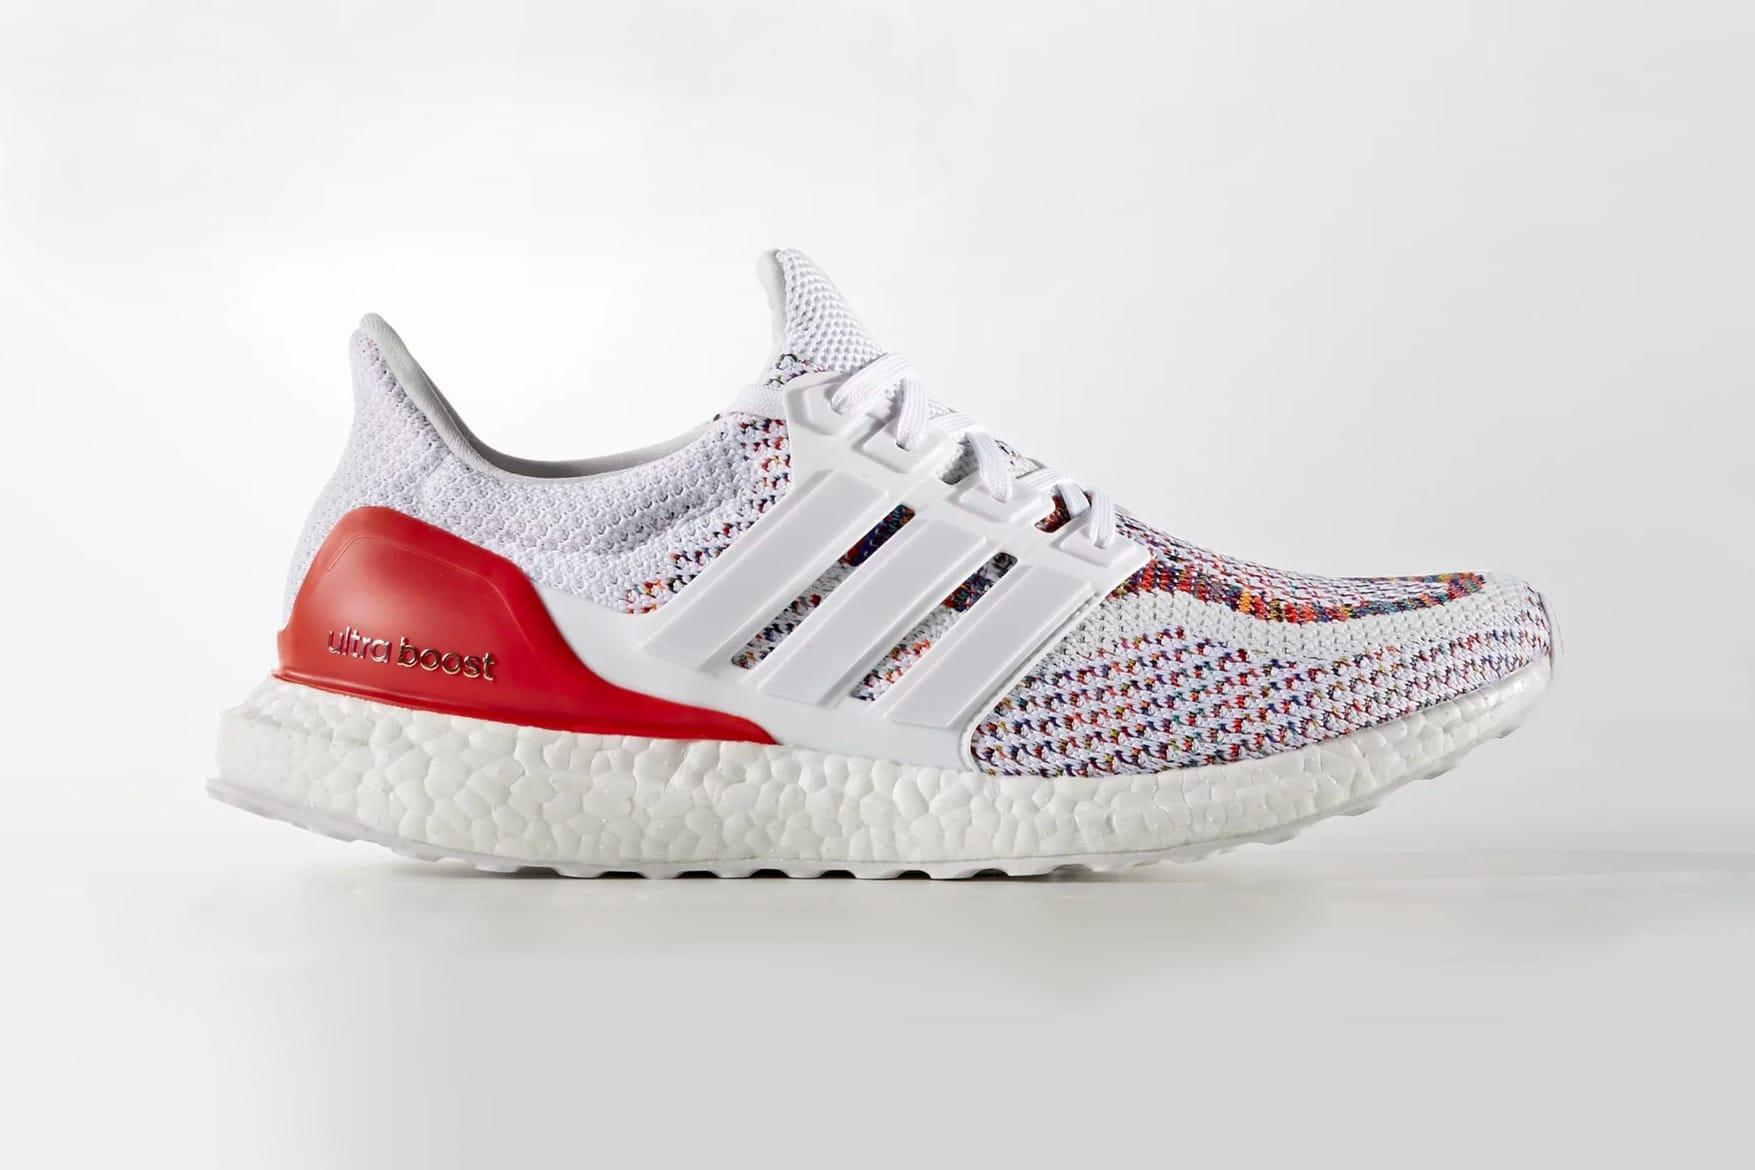 adidas UltraBOOST Multicolor, Foot